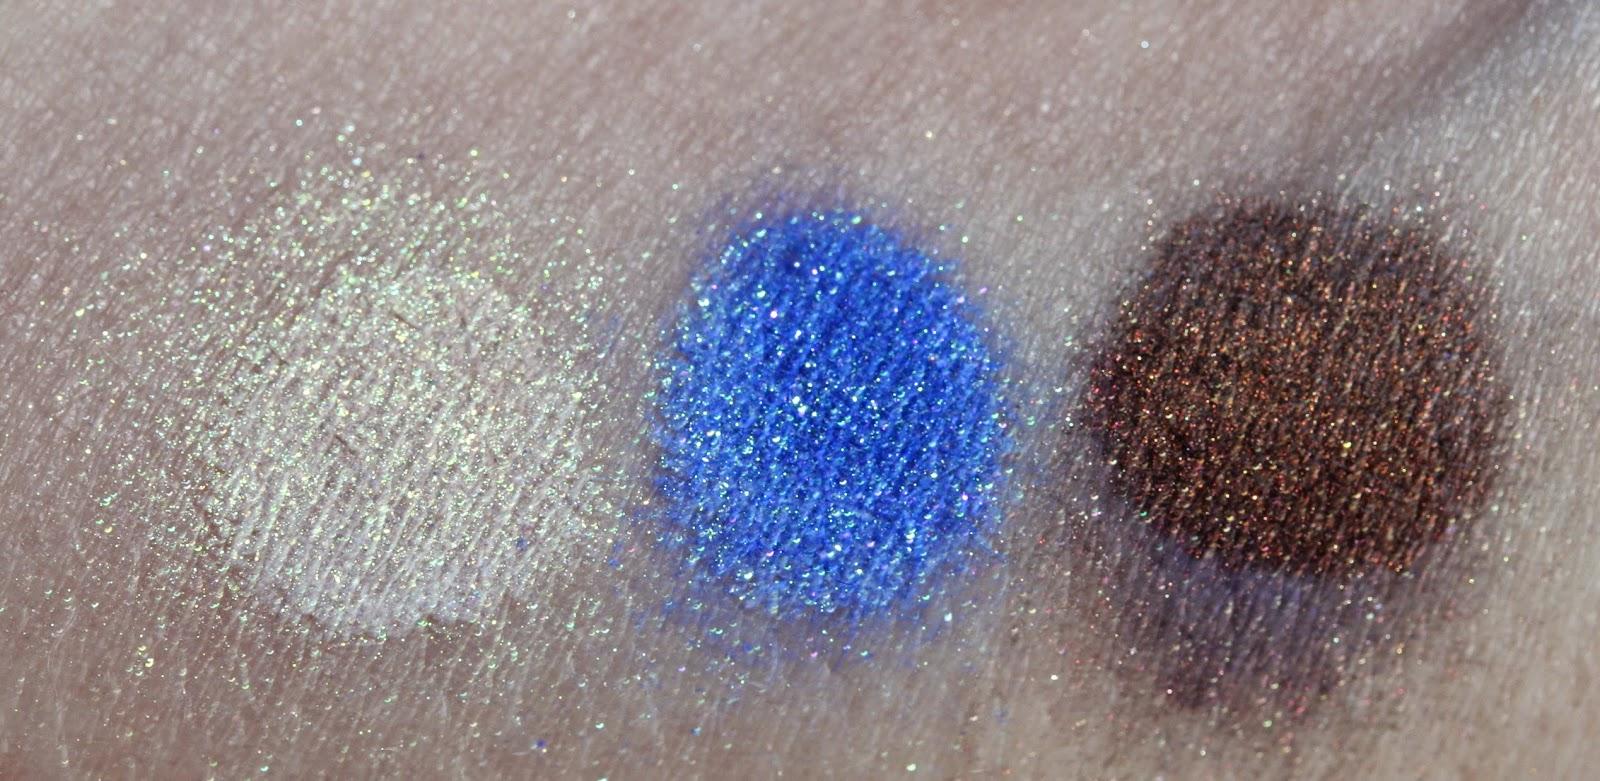 Moon Prism Powder, Yzma's Essence of Llama, Tardis with flash